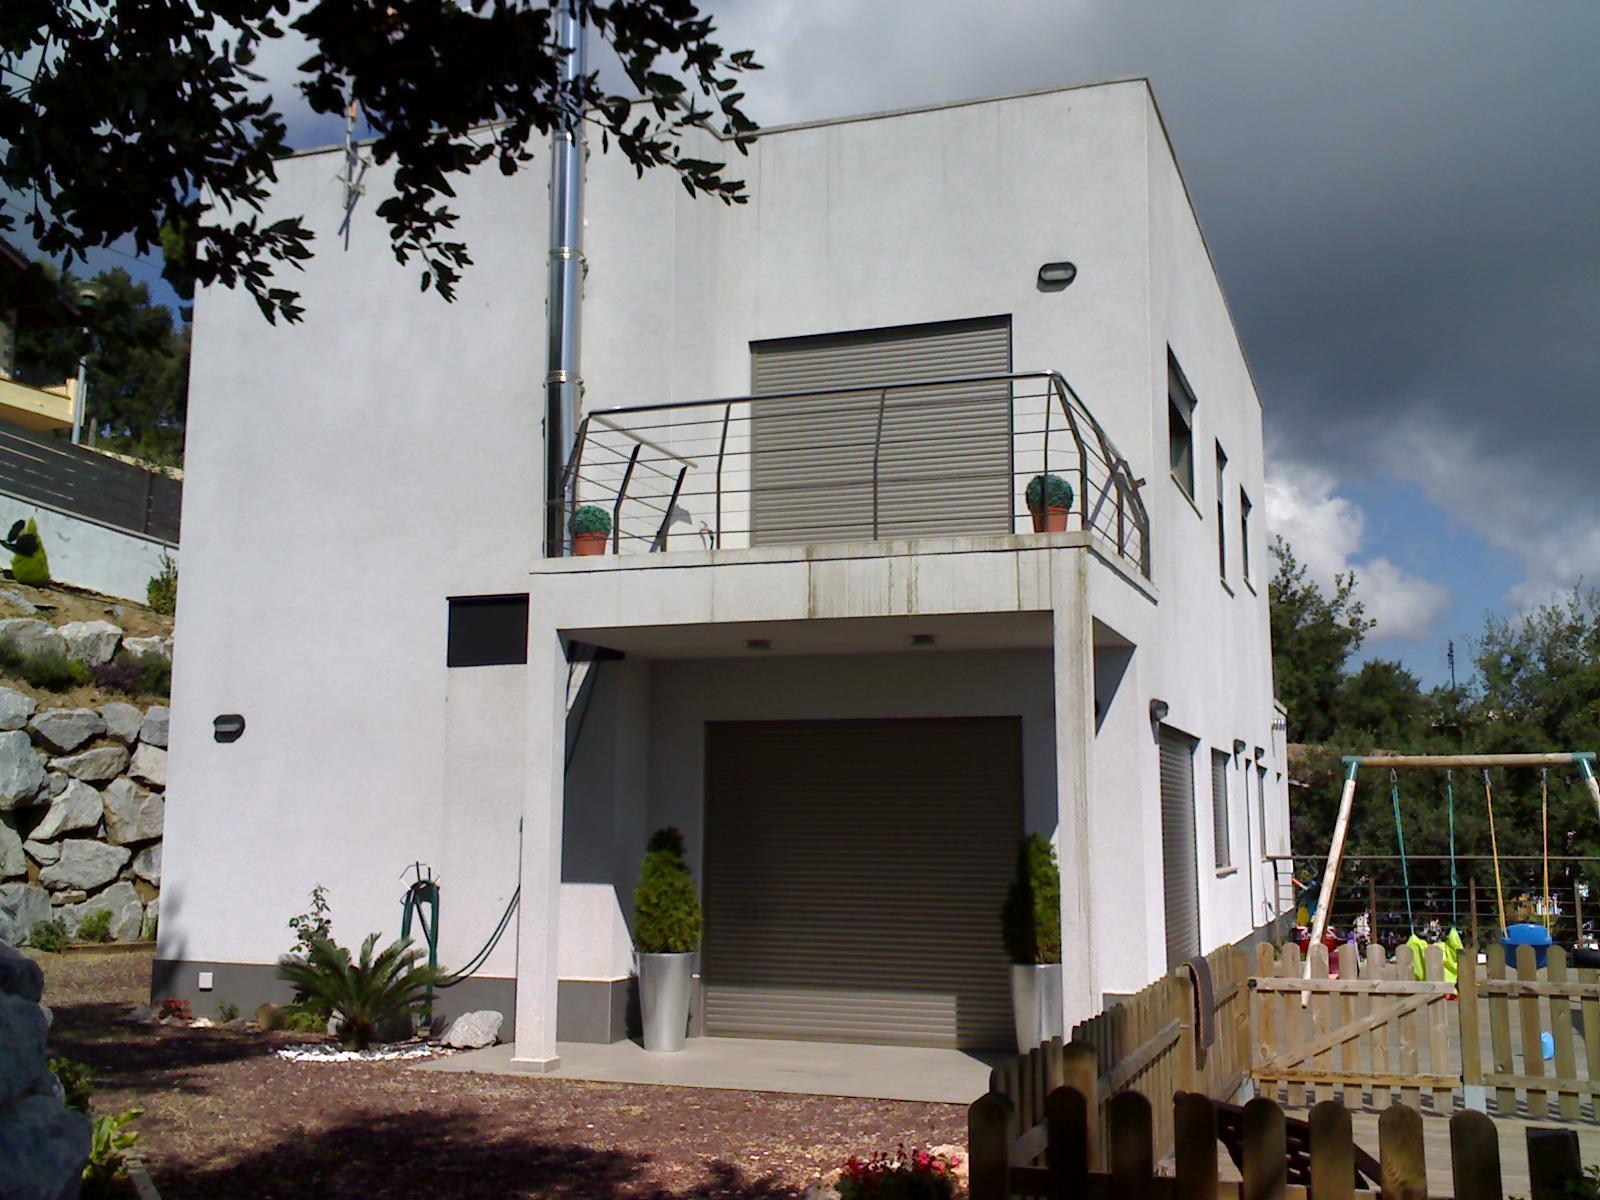 Construccion de casas en acero steel framing house - Casas ecologicas en espana ...